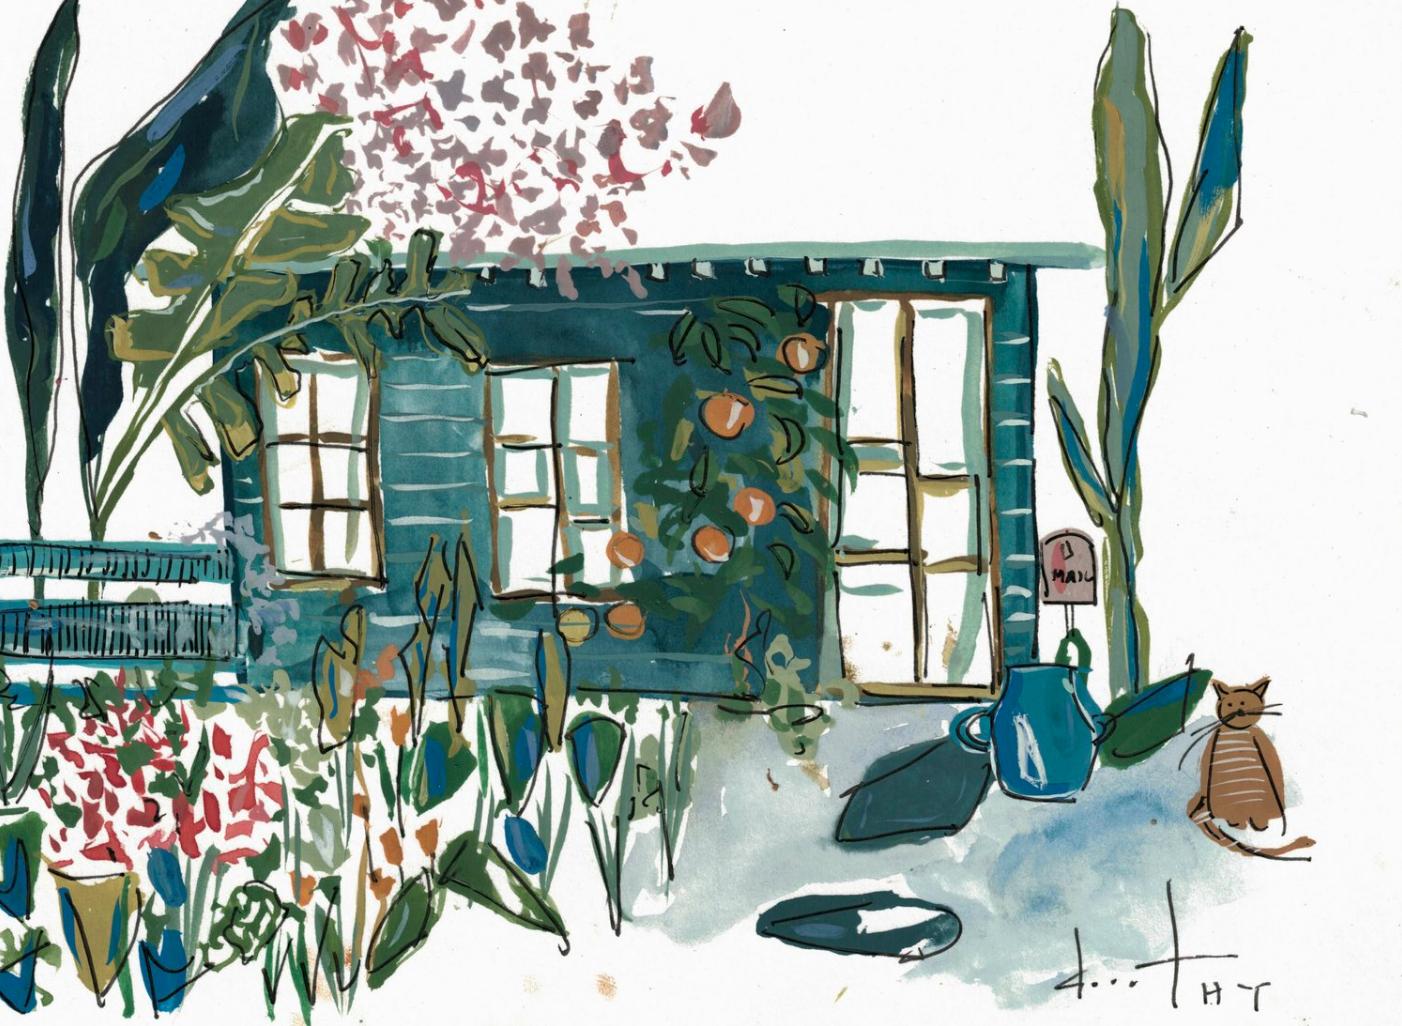 Artist Dorothy Shain